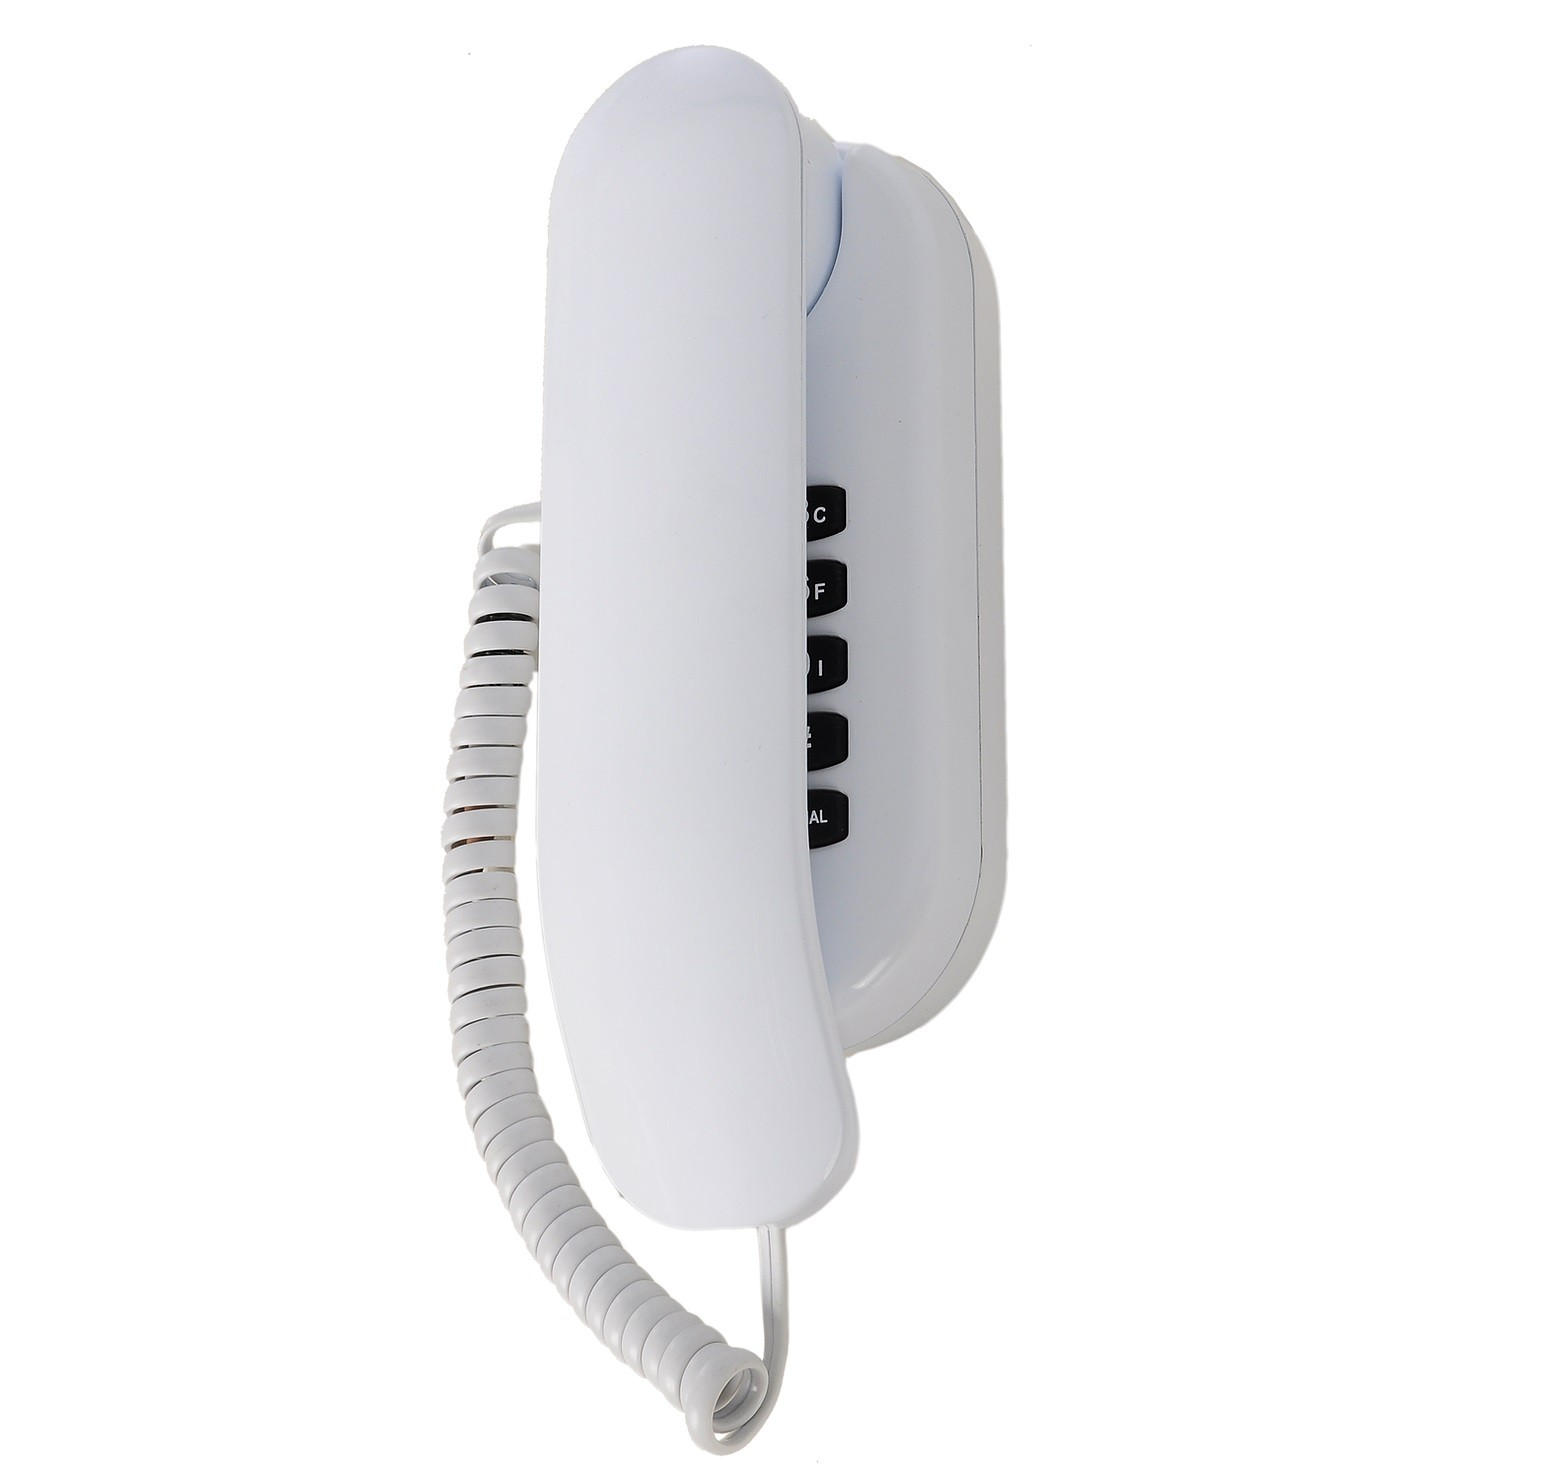 AGL TELEFONE/TERMINAL INTERFONE PARA CENTRAL TDI 100 BRANCO